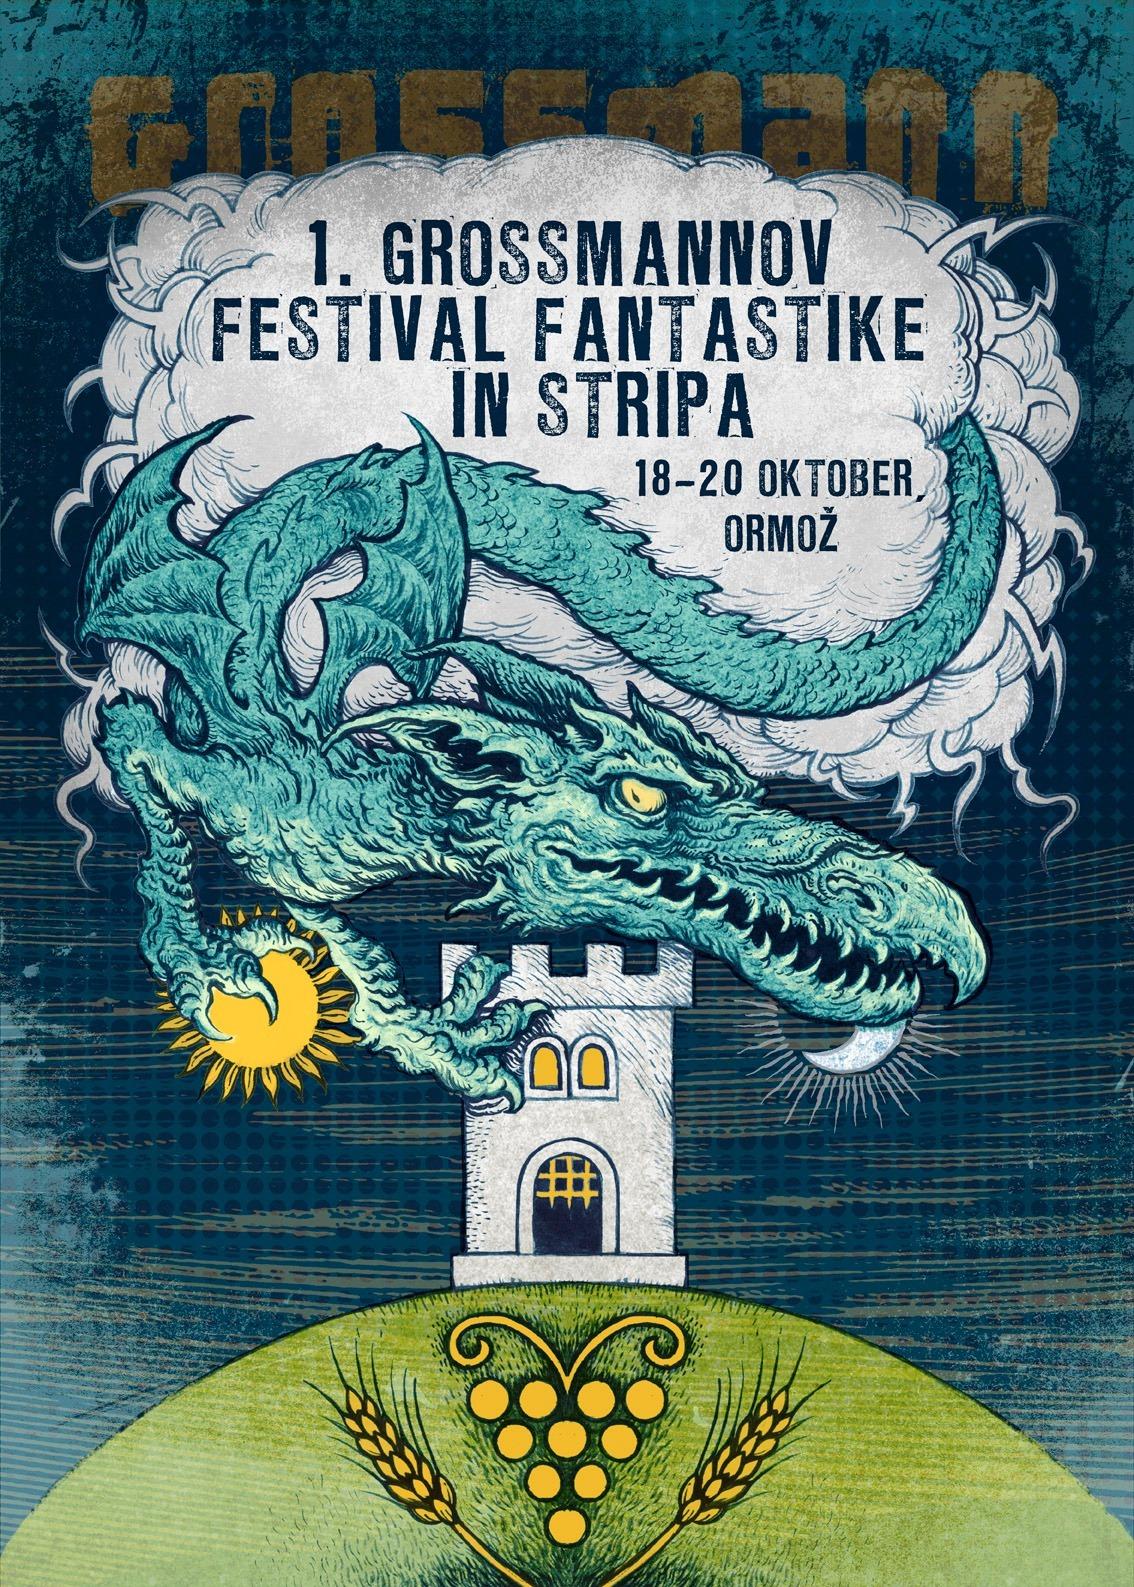 1. Grossmannov festival fantastike i stripa